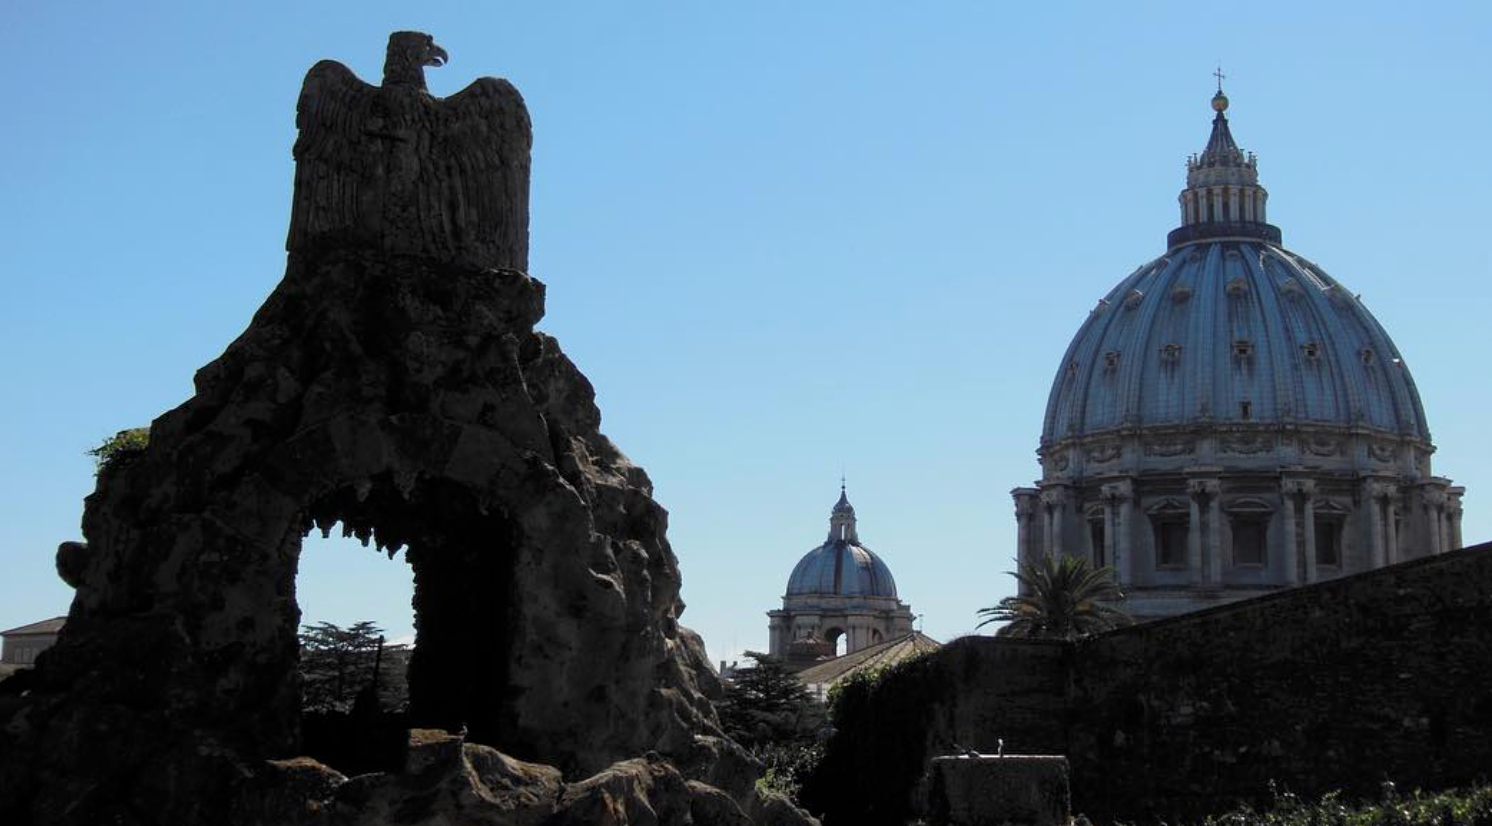 Fontana dell'Aquila e Cupola San Pietro - photo by @marco.casavecchia